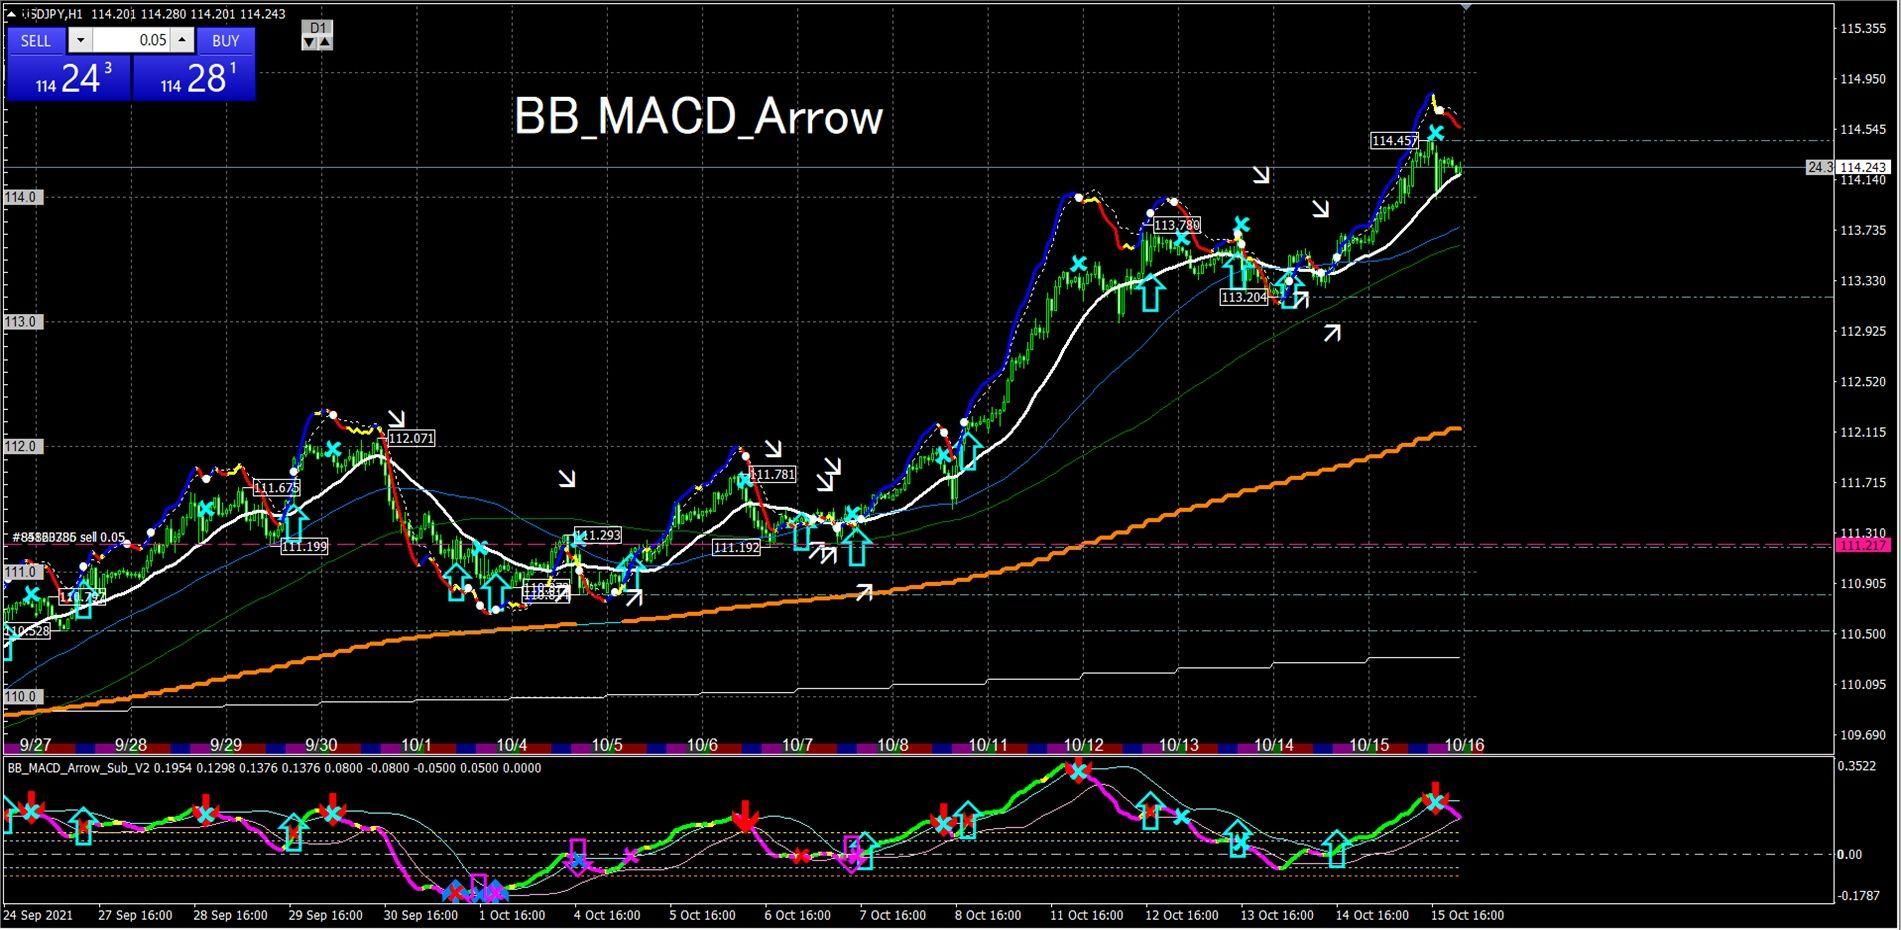 「 BB_MACD_Arrow 」 MACDにボリンジャーバンドを組み合わせたインジケーターを使用しサインを表示するインジケーターです